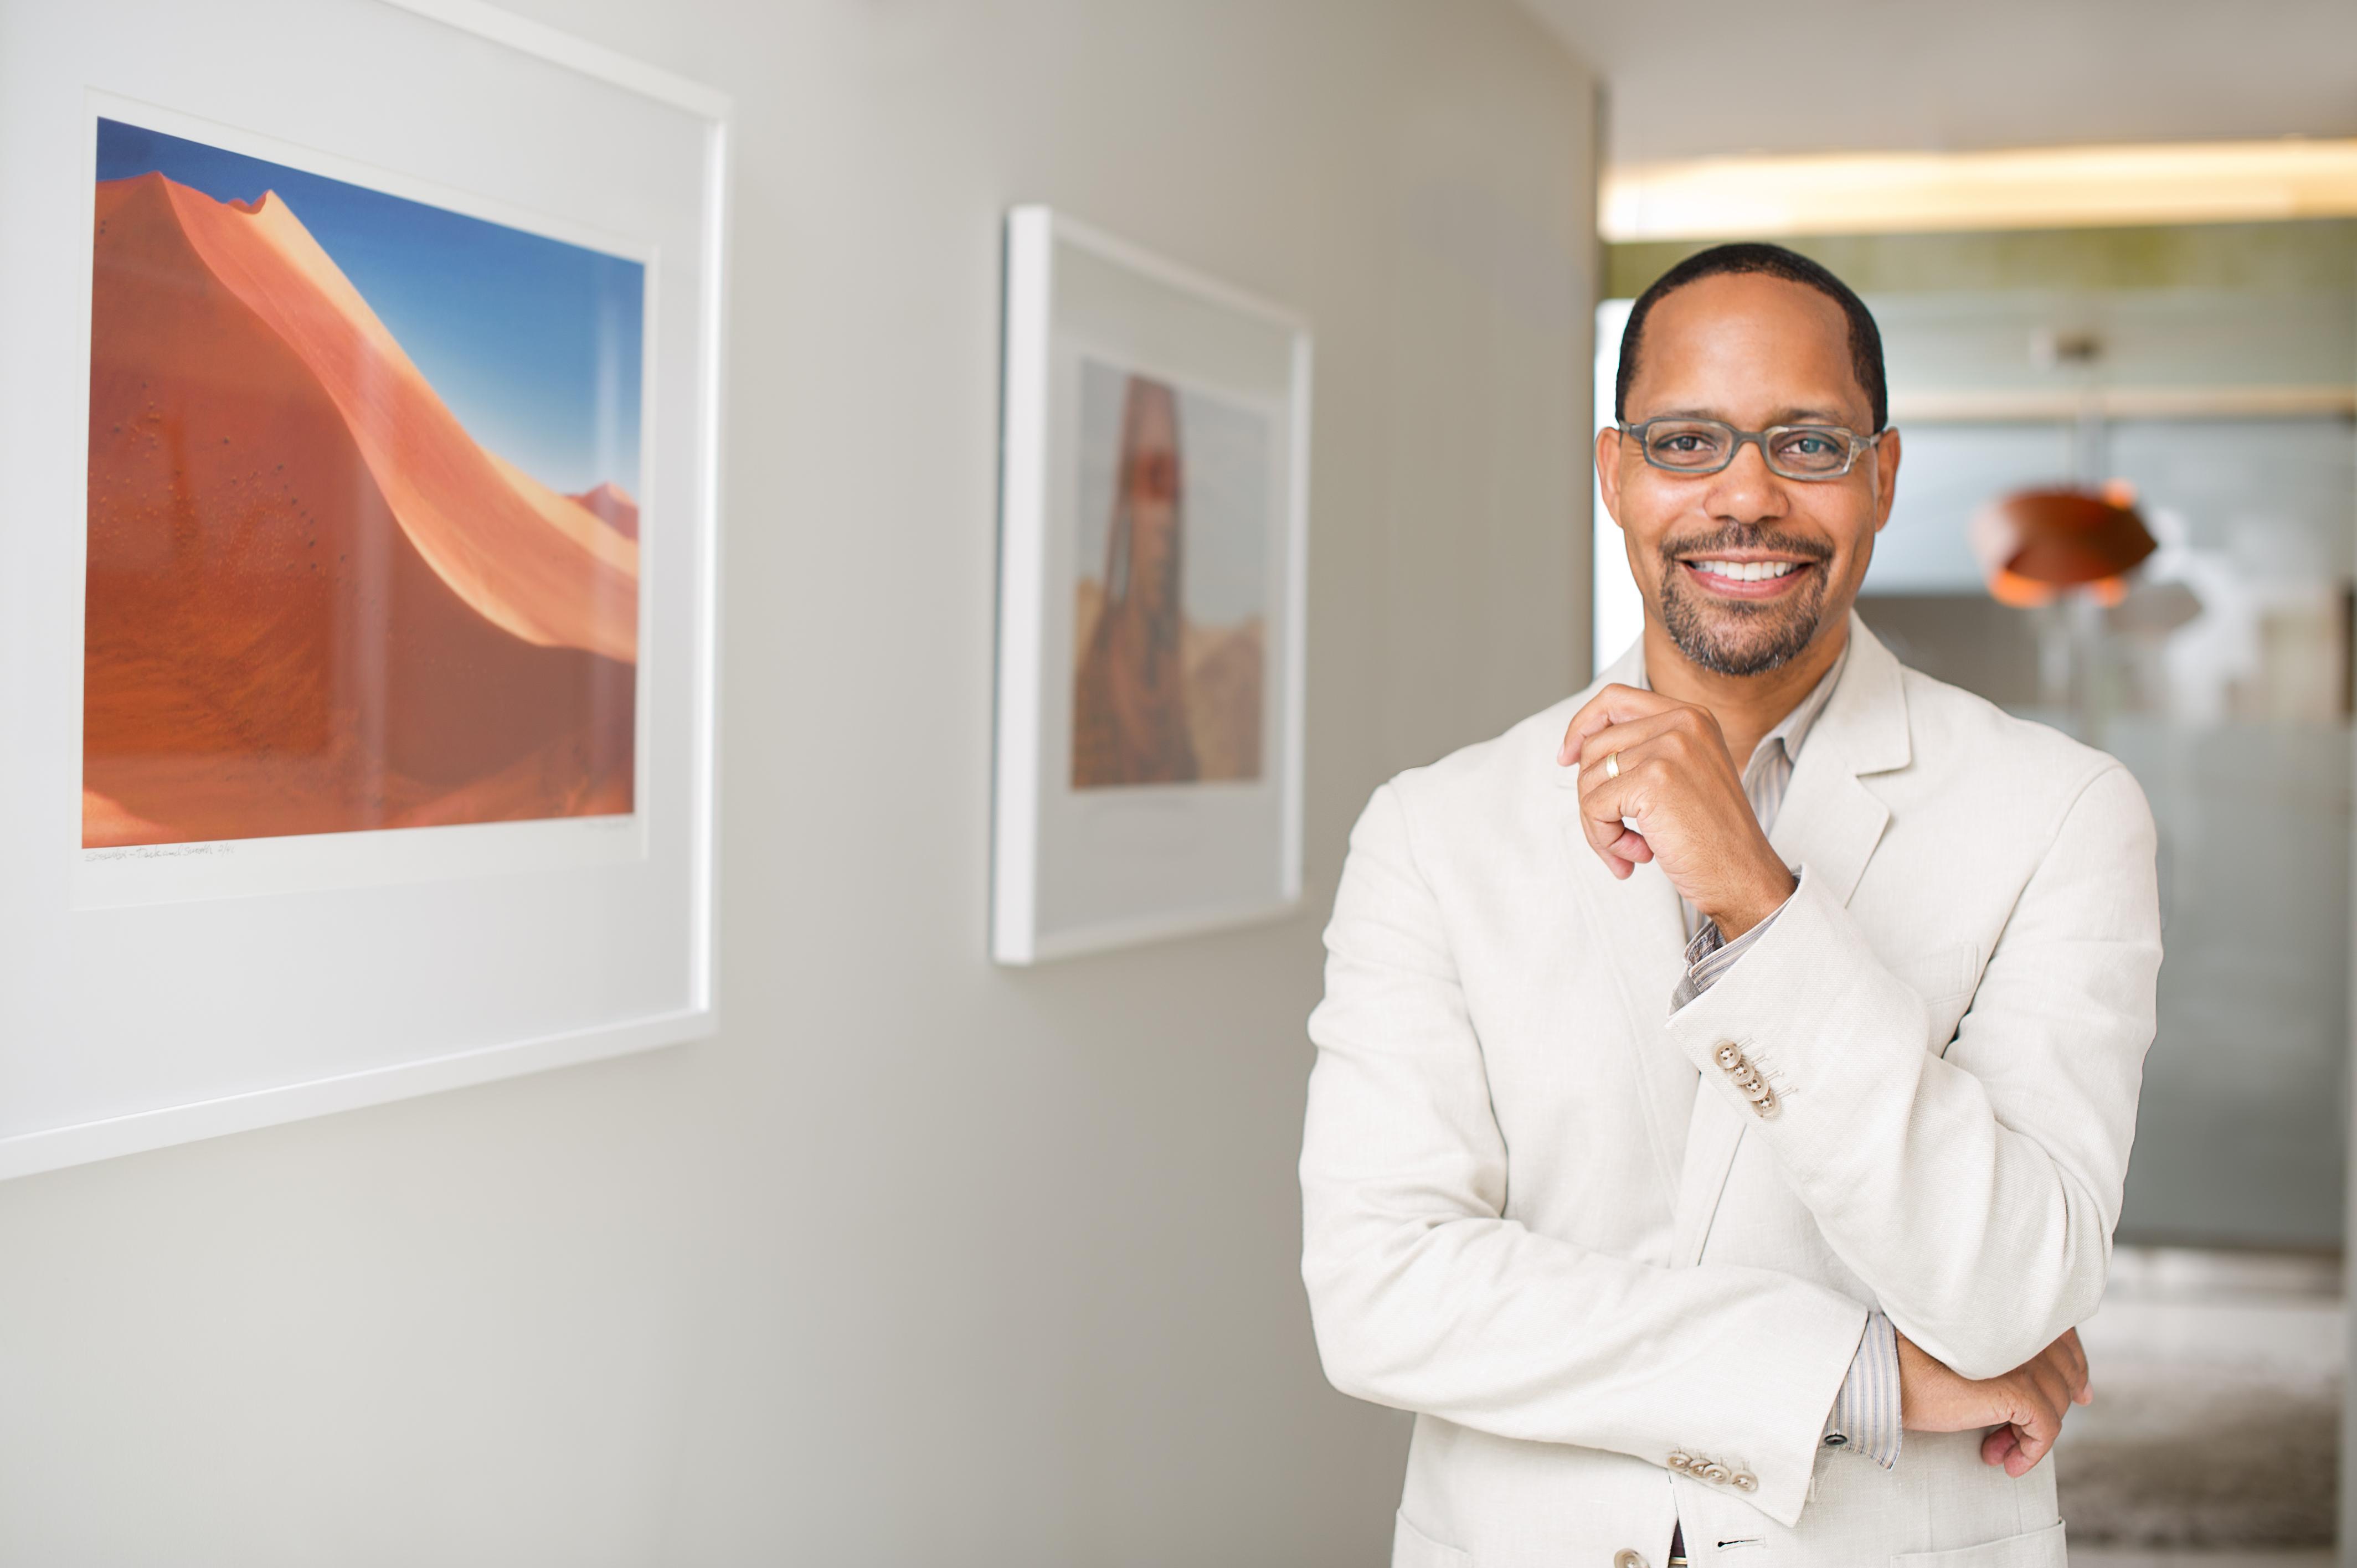 Dr. Monte Harris